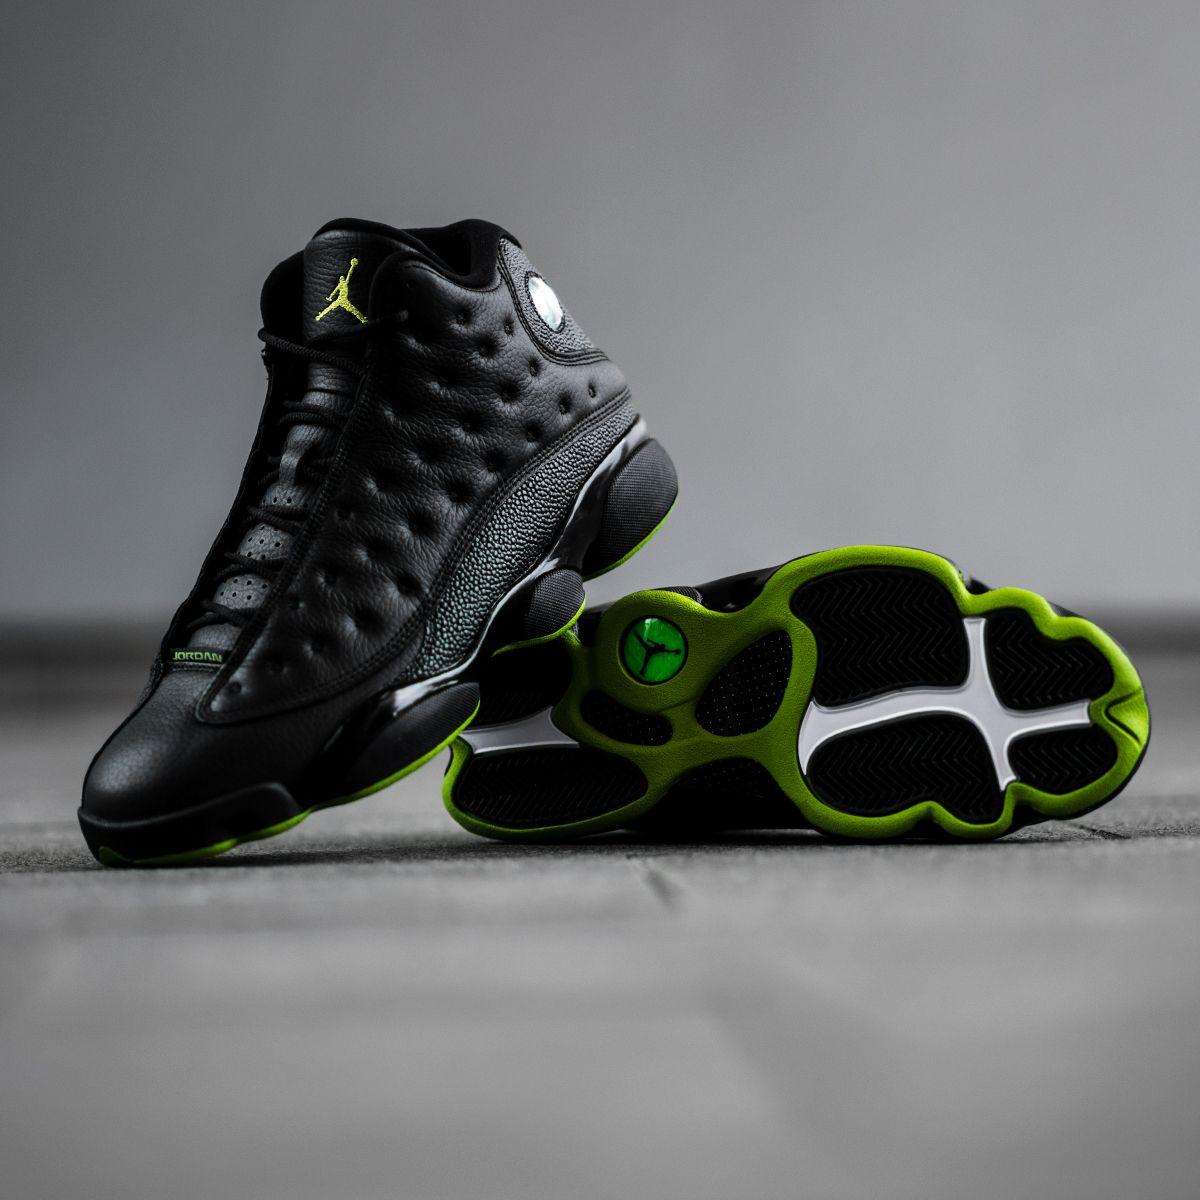 bc64d2b0b1c The green eyed black cat returns this Thursday. Get the Air Jordan 13 Retro  '